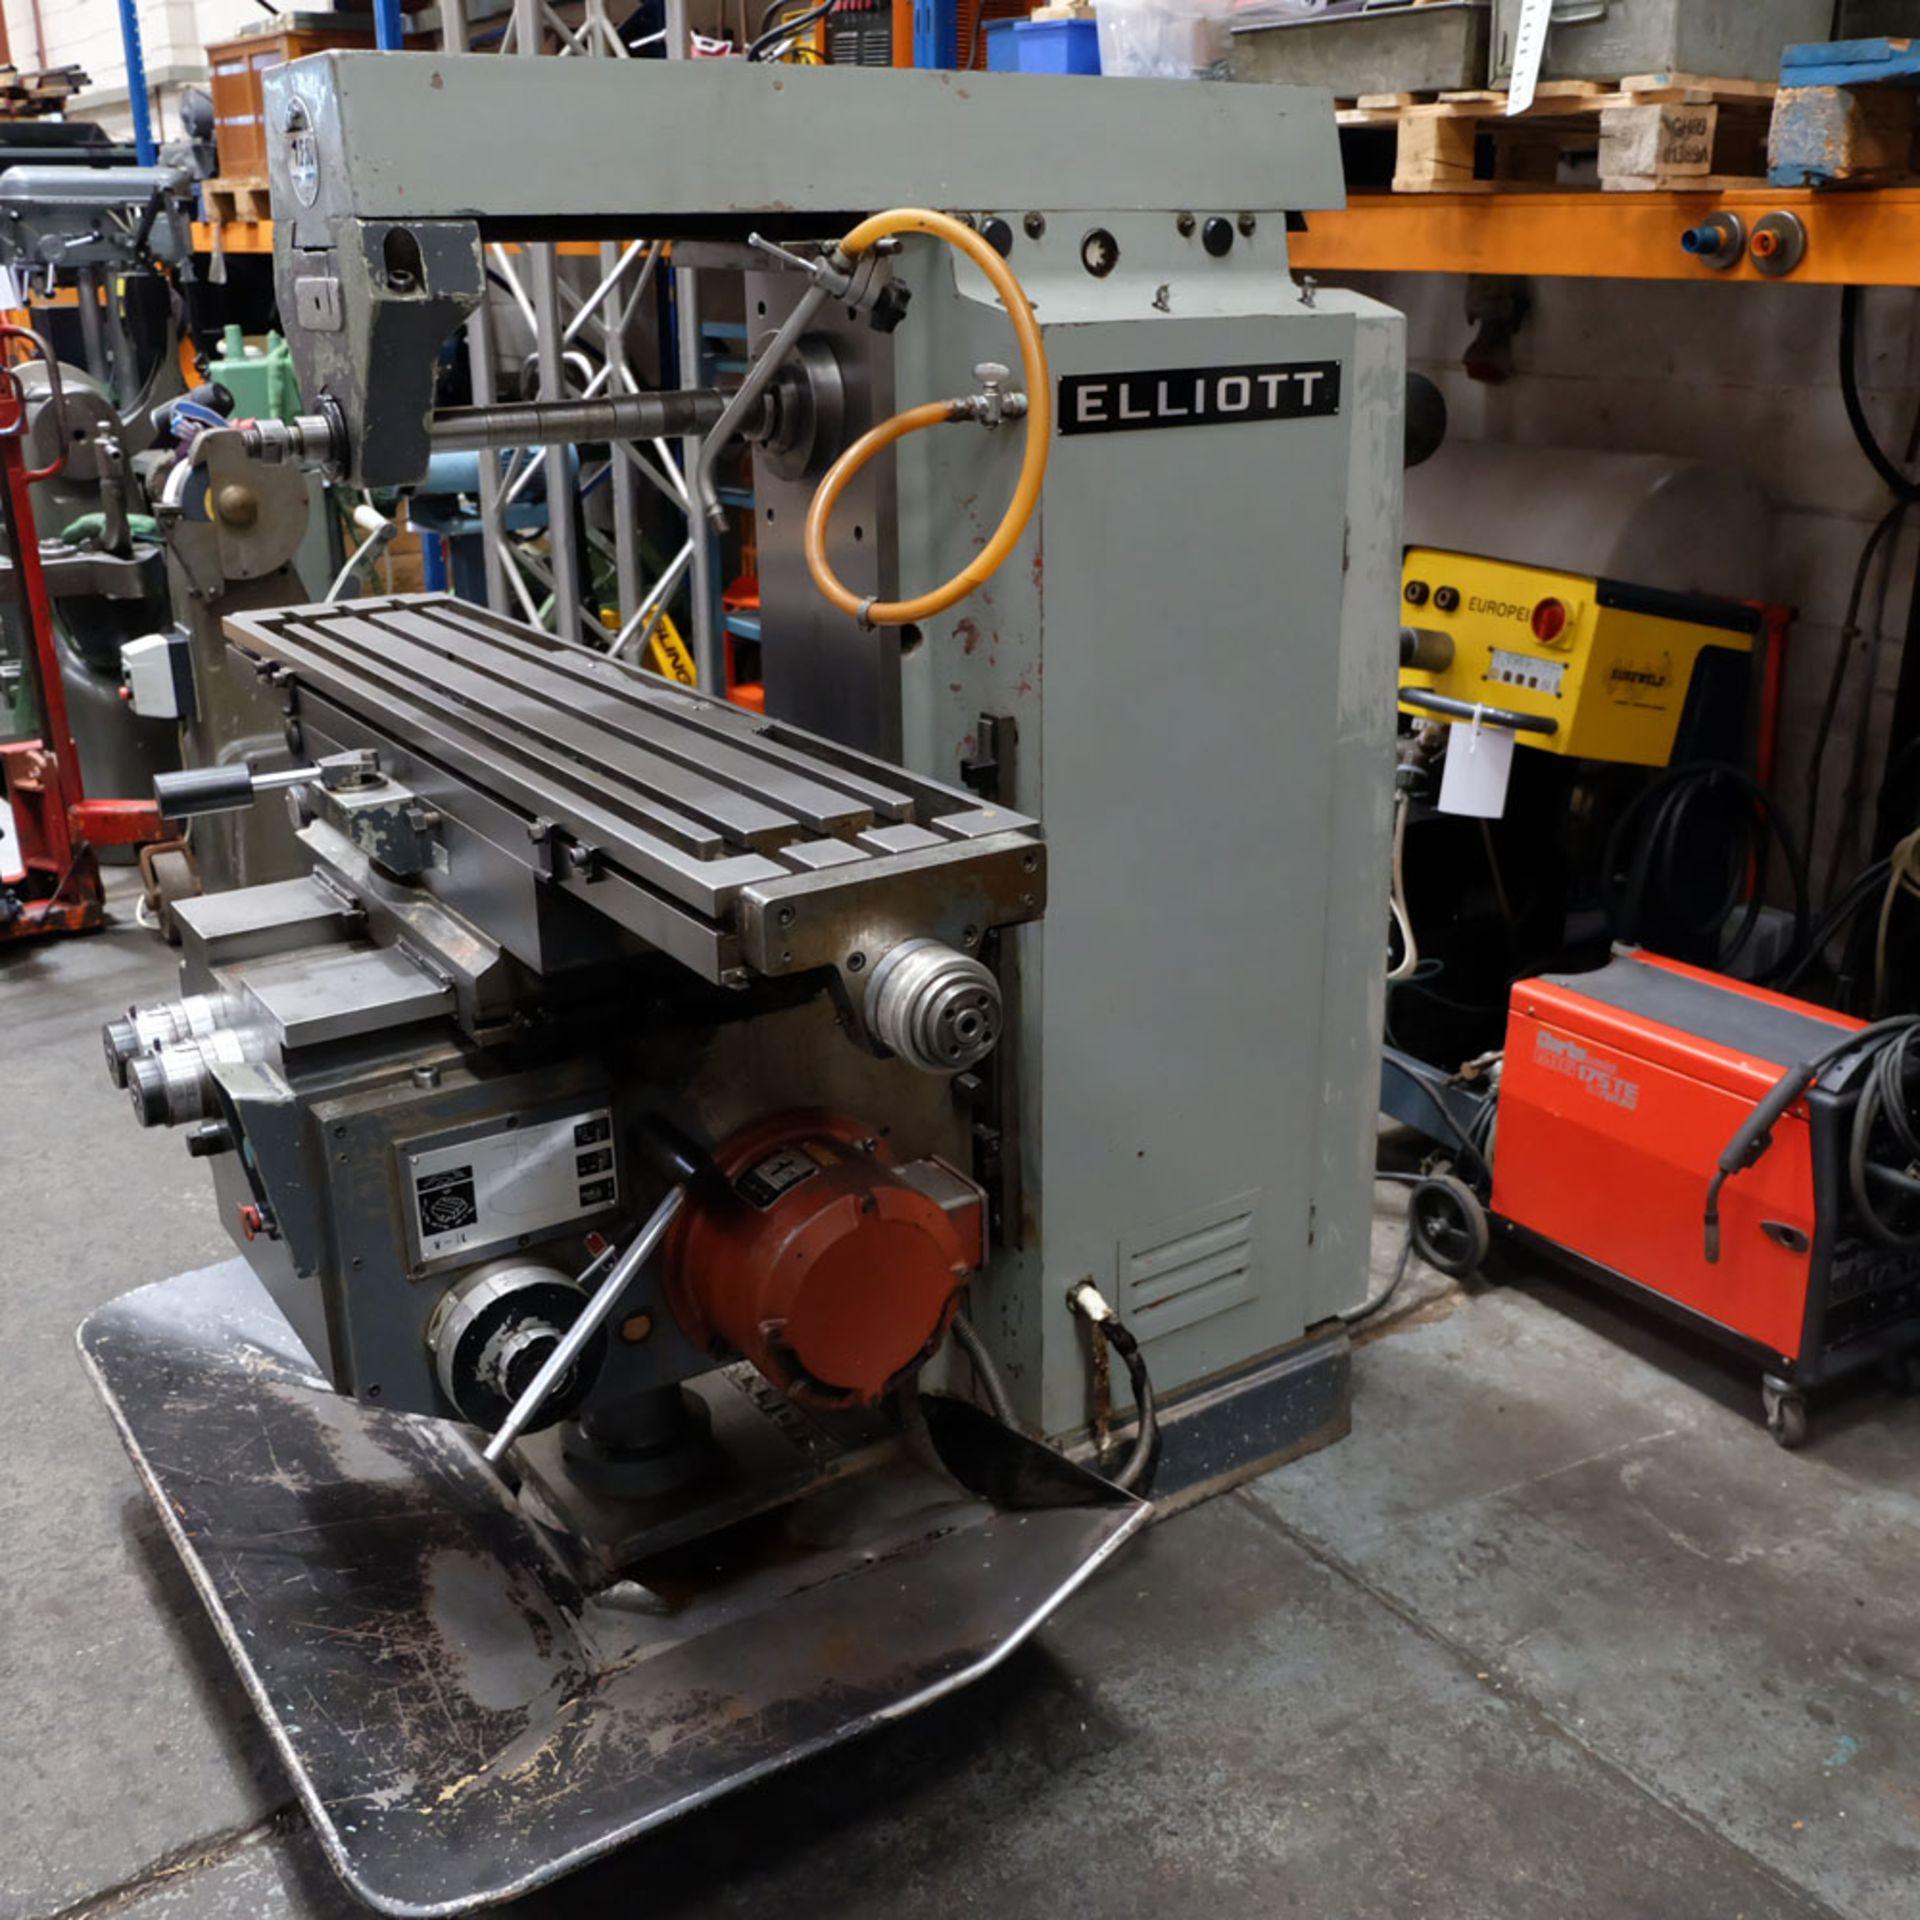 Elliott Horizontal Milling Machine. - Image 11 of 12